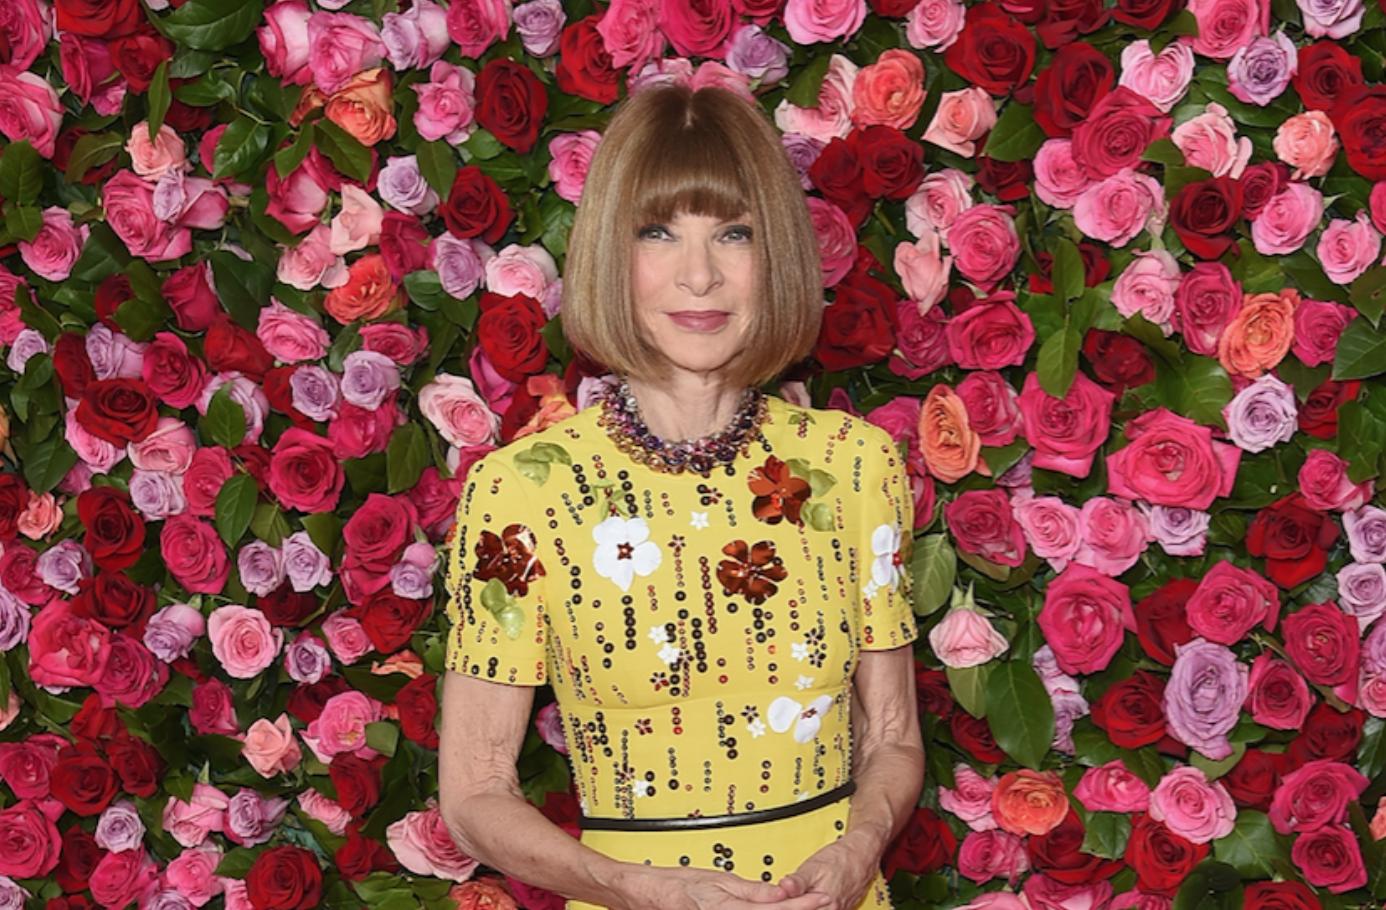 Anna Wintour at Vogue 'Indefinitely'